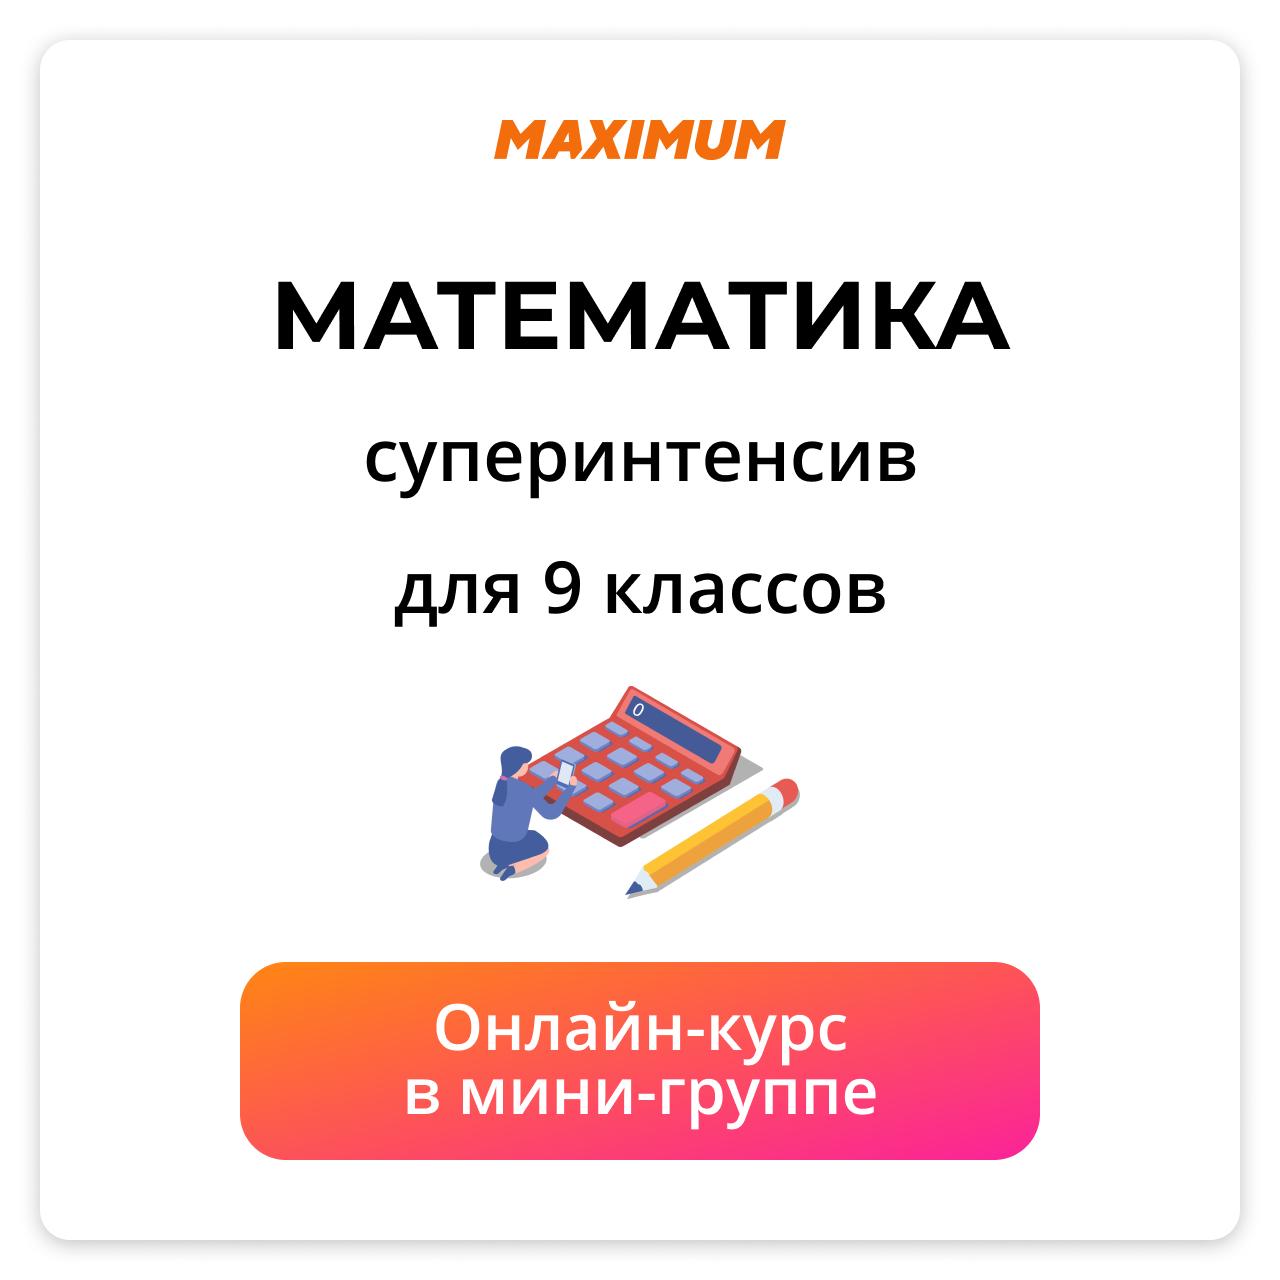 Математика ОГЭ Мини-группа